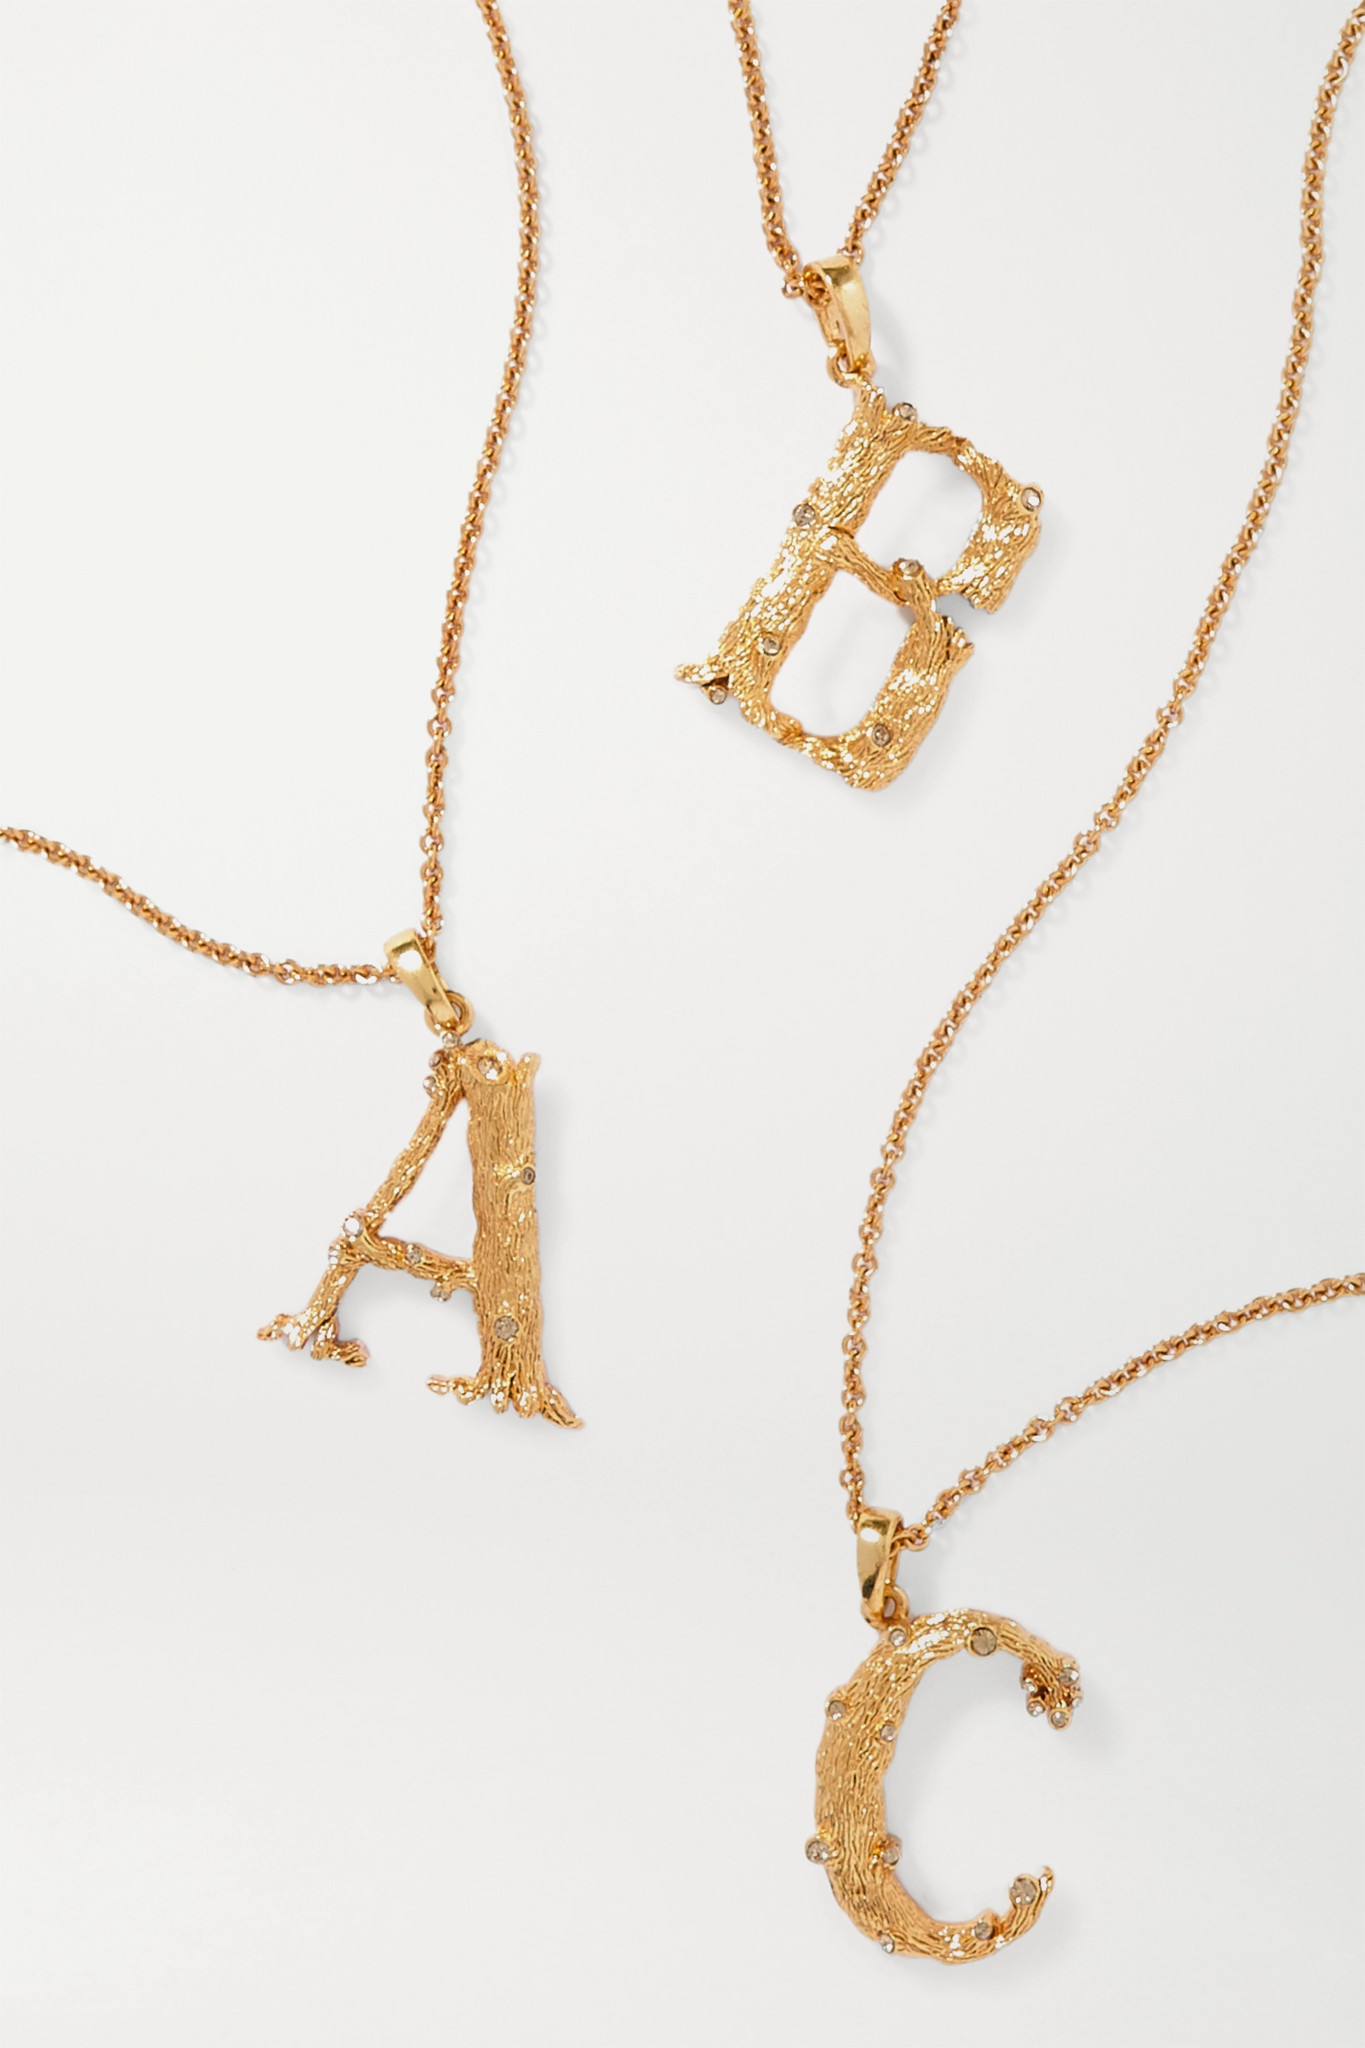 OSCAR DE LA RENTA - Letter Gold-plated Crystal Necklace - D